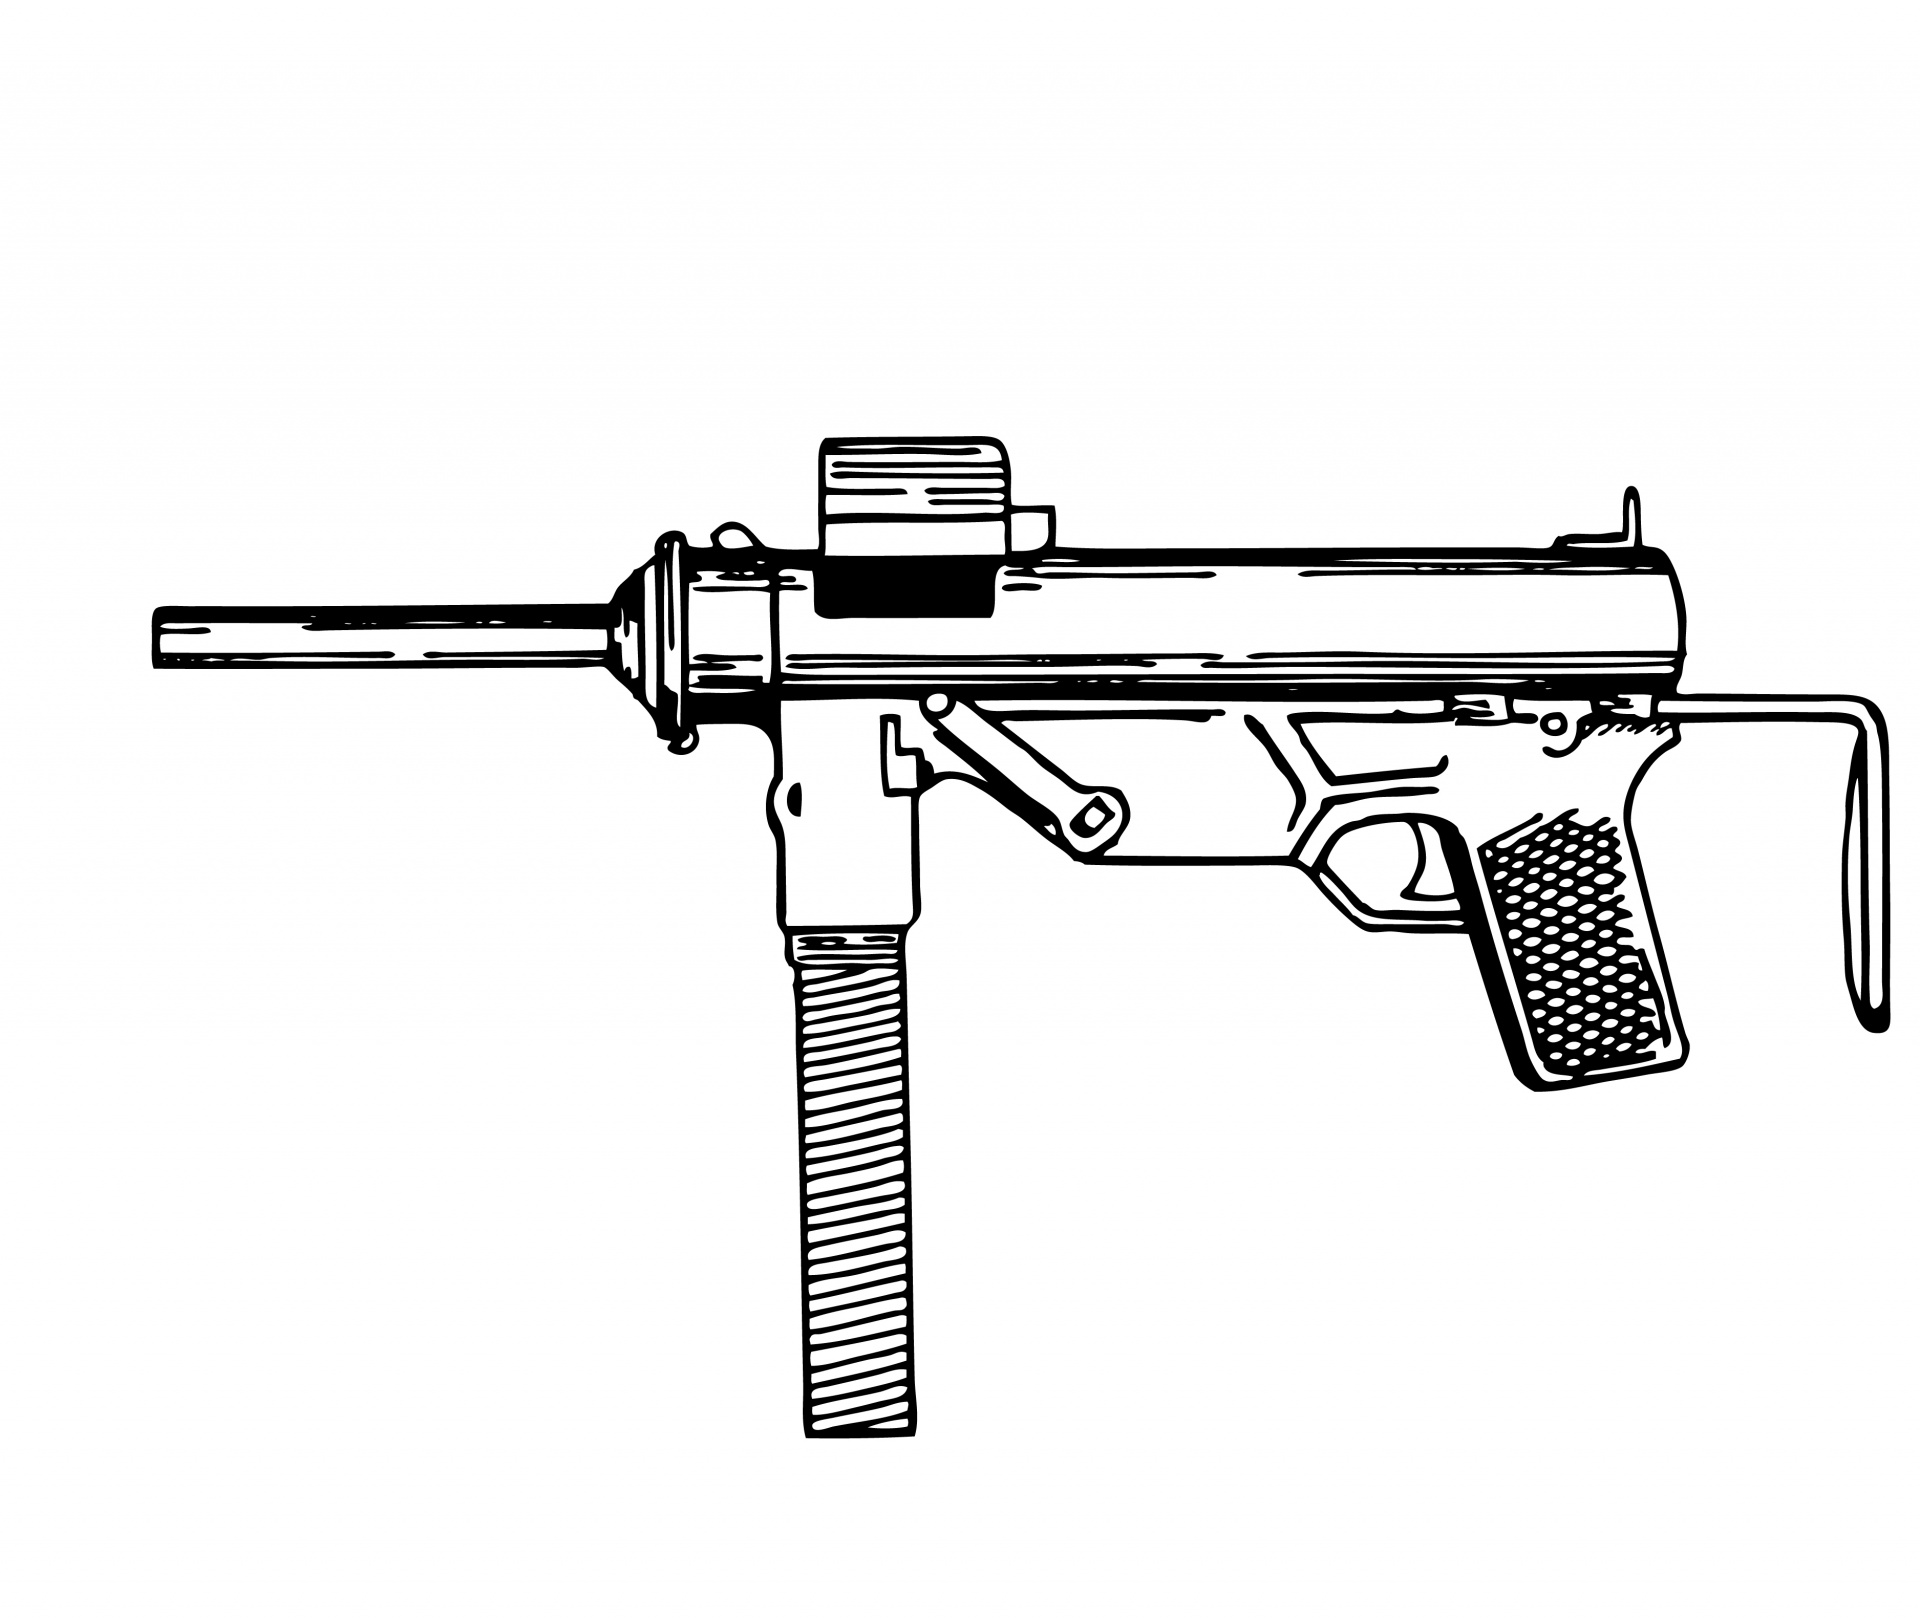 Submachine Gun Illustration Clipart Free Stock Photo